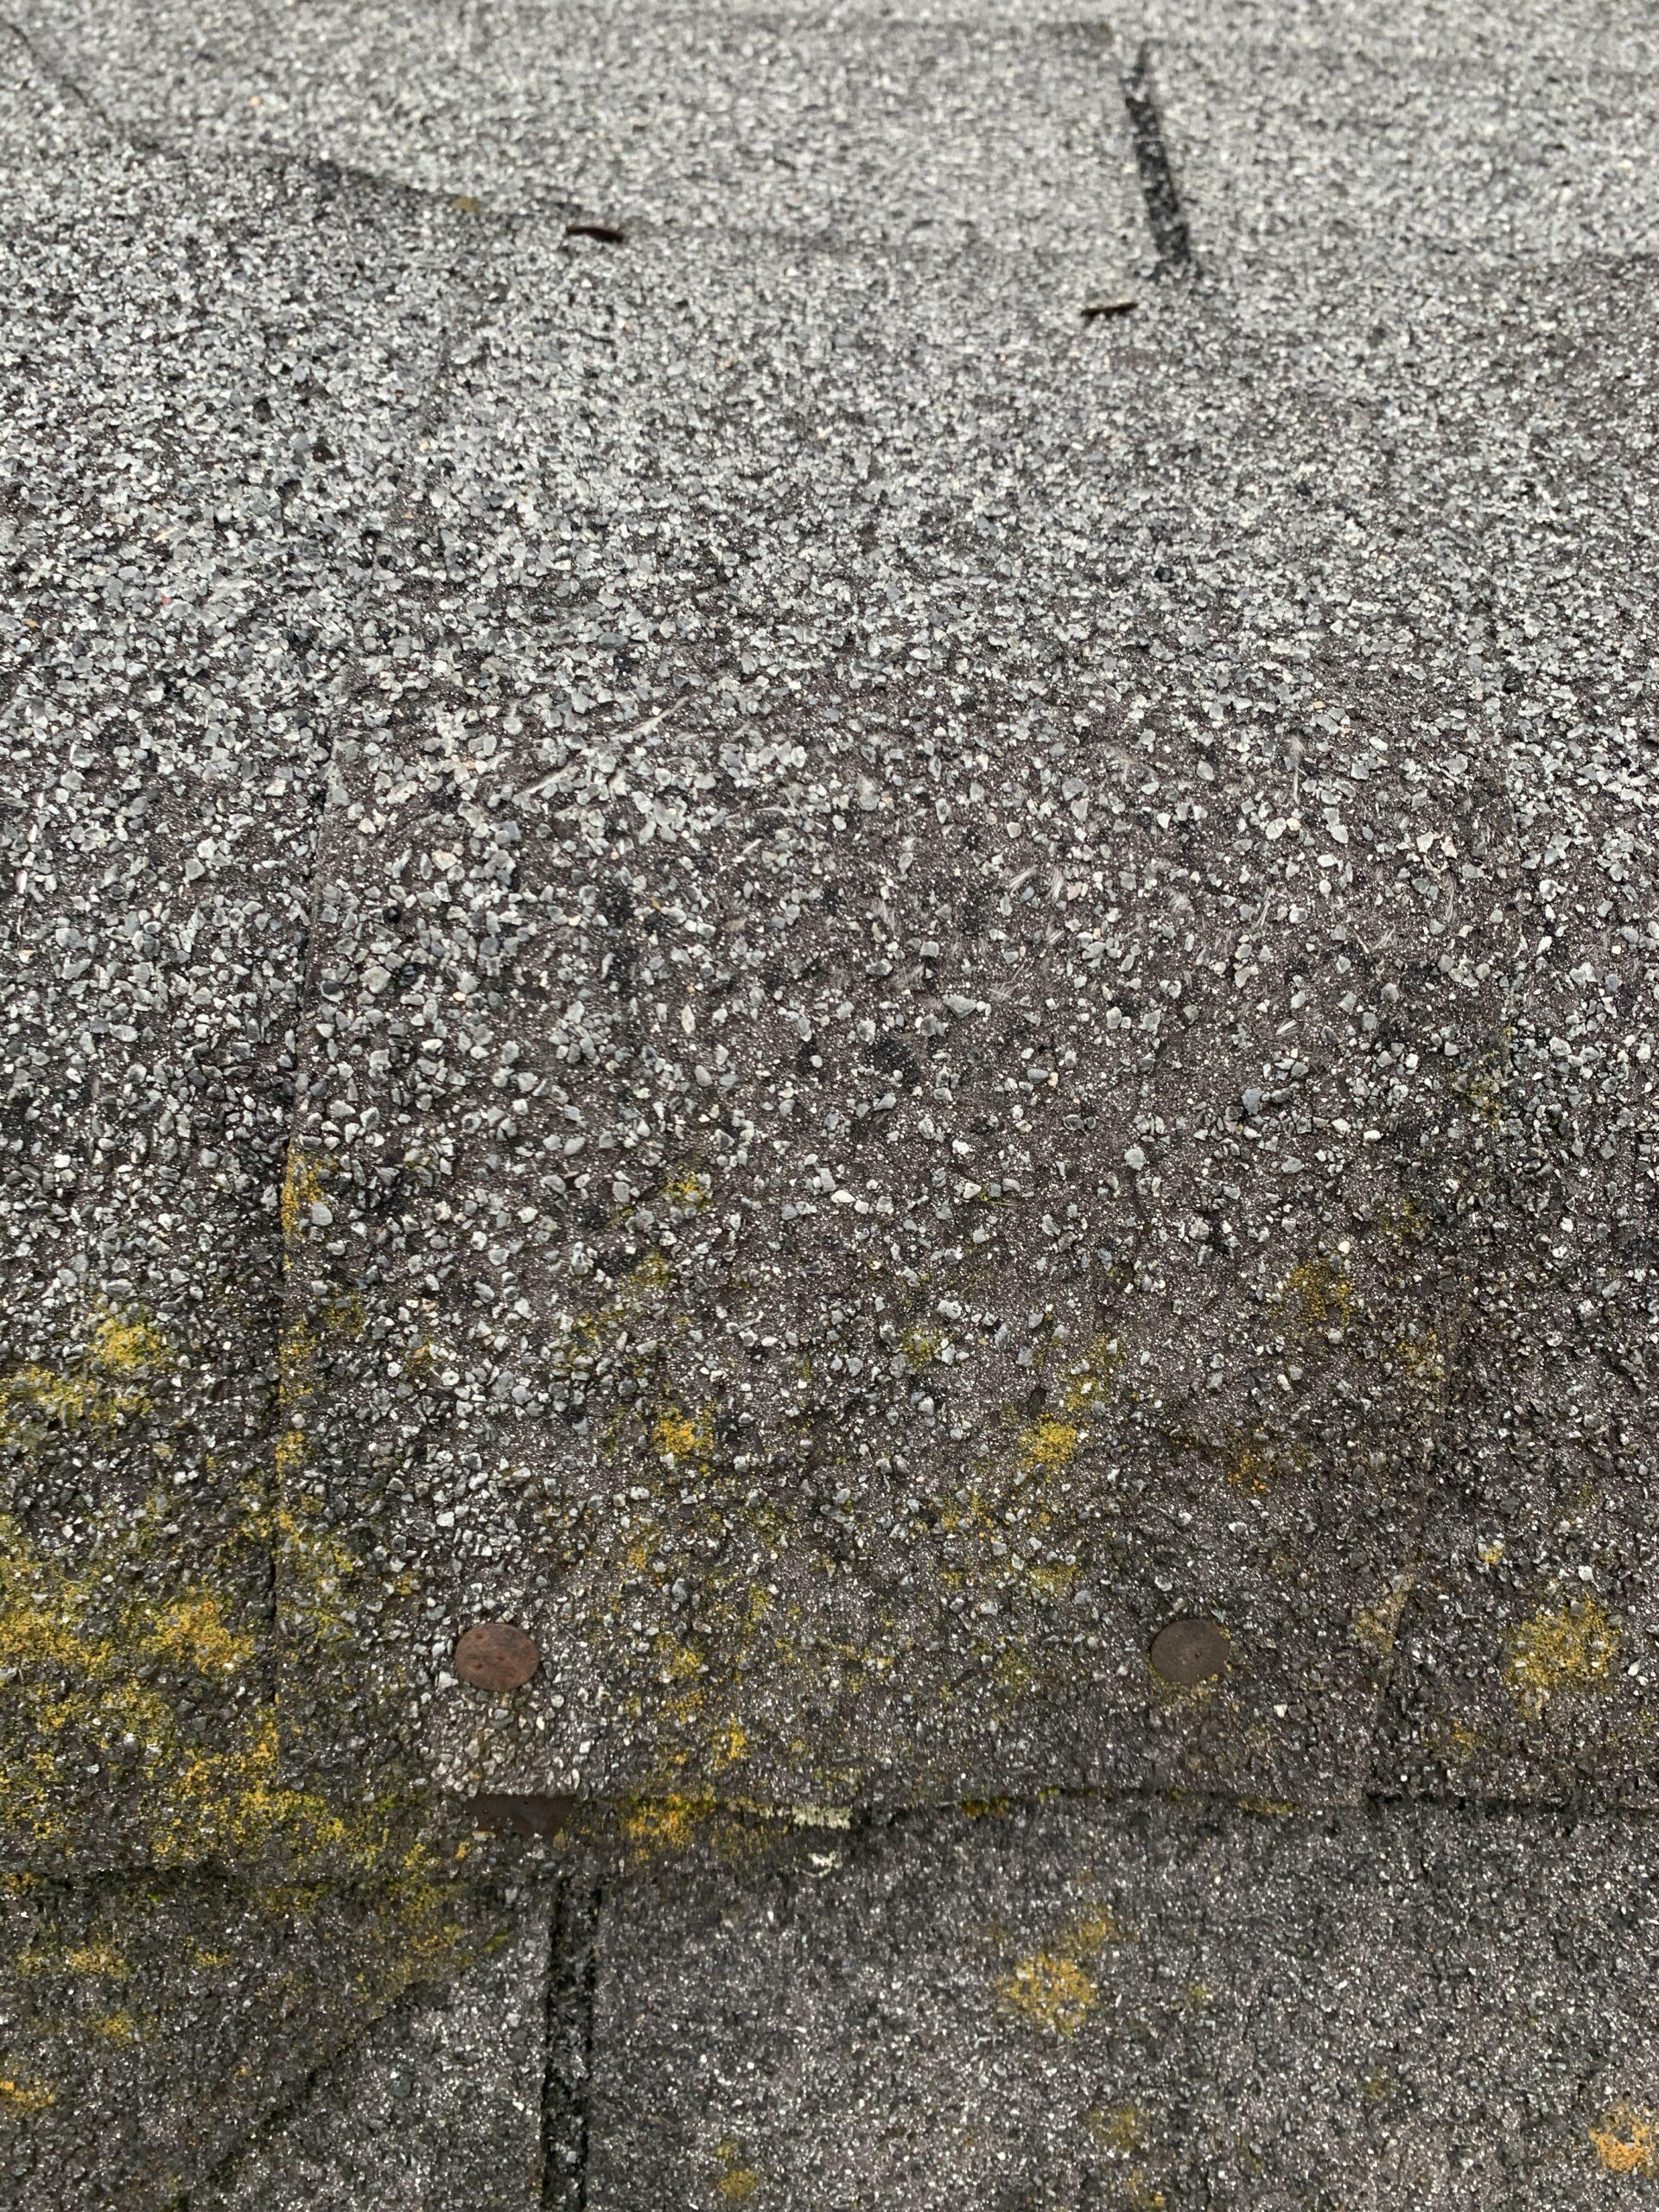 Old three tab shingle roof. Then shingles granule loss and moss and algae